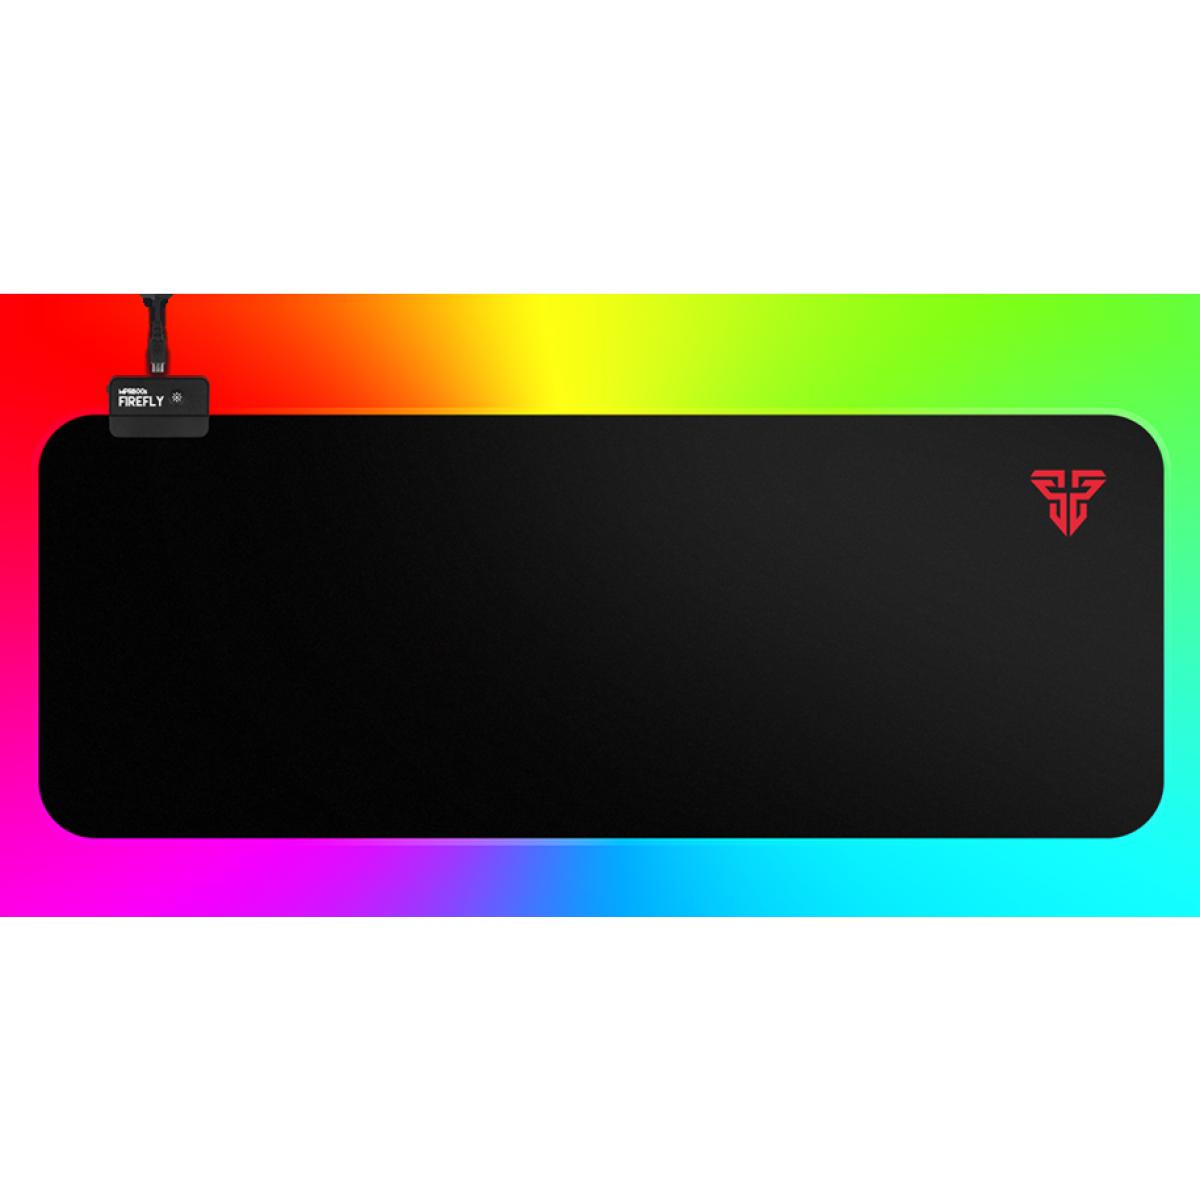 Mousepad Gamer Fantech Firefly, Black, RGB, 800x300mm, MPR800s